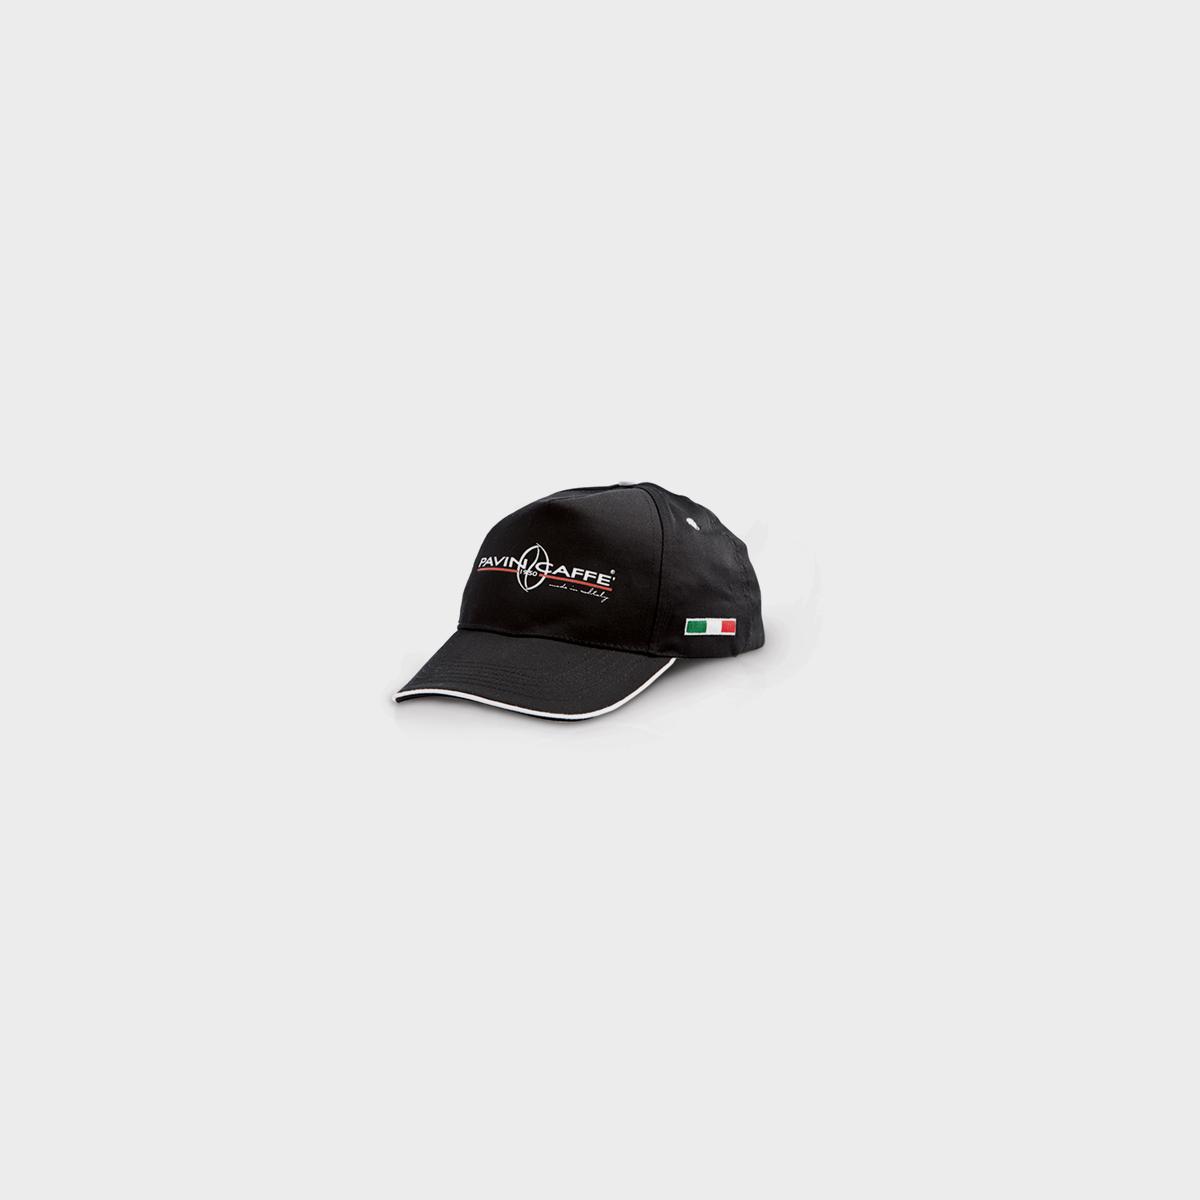 cappellino-pavin-caffe